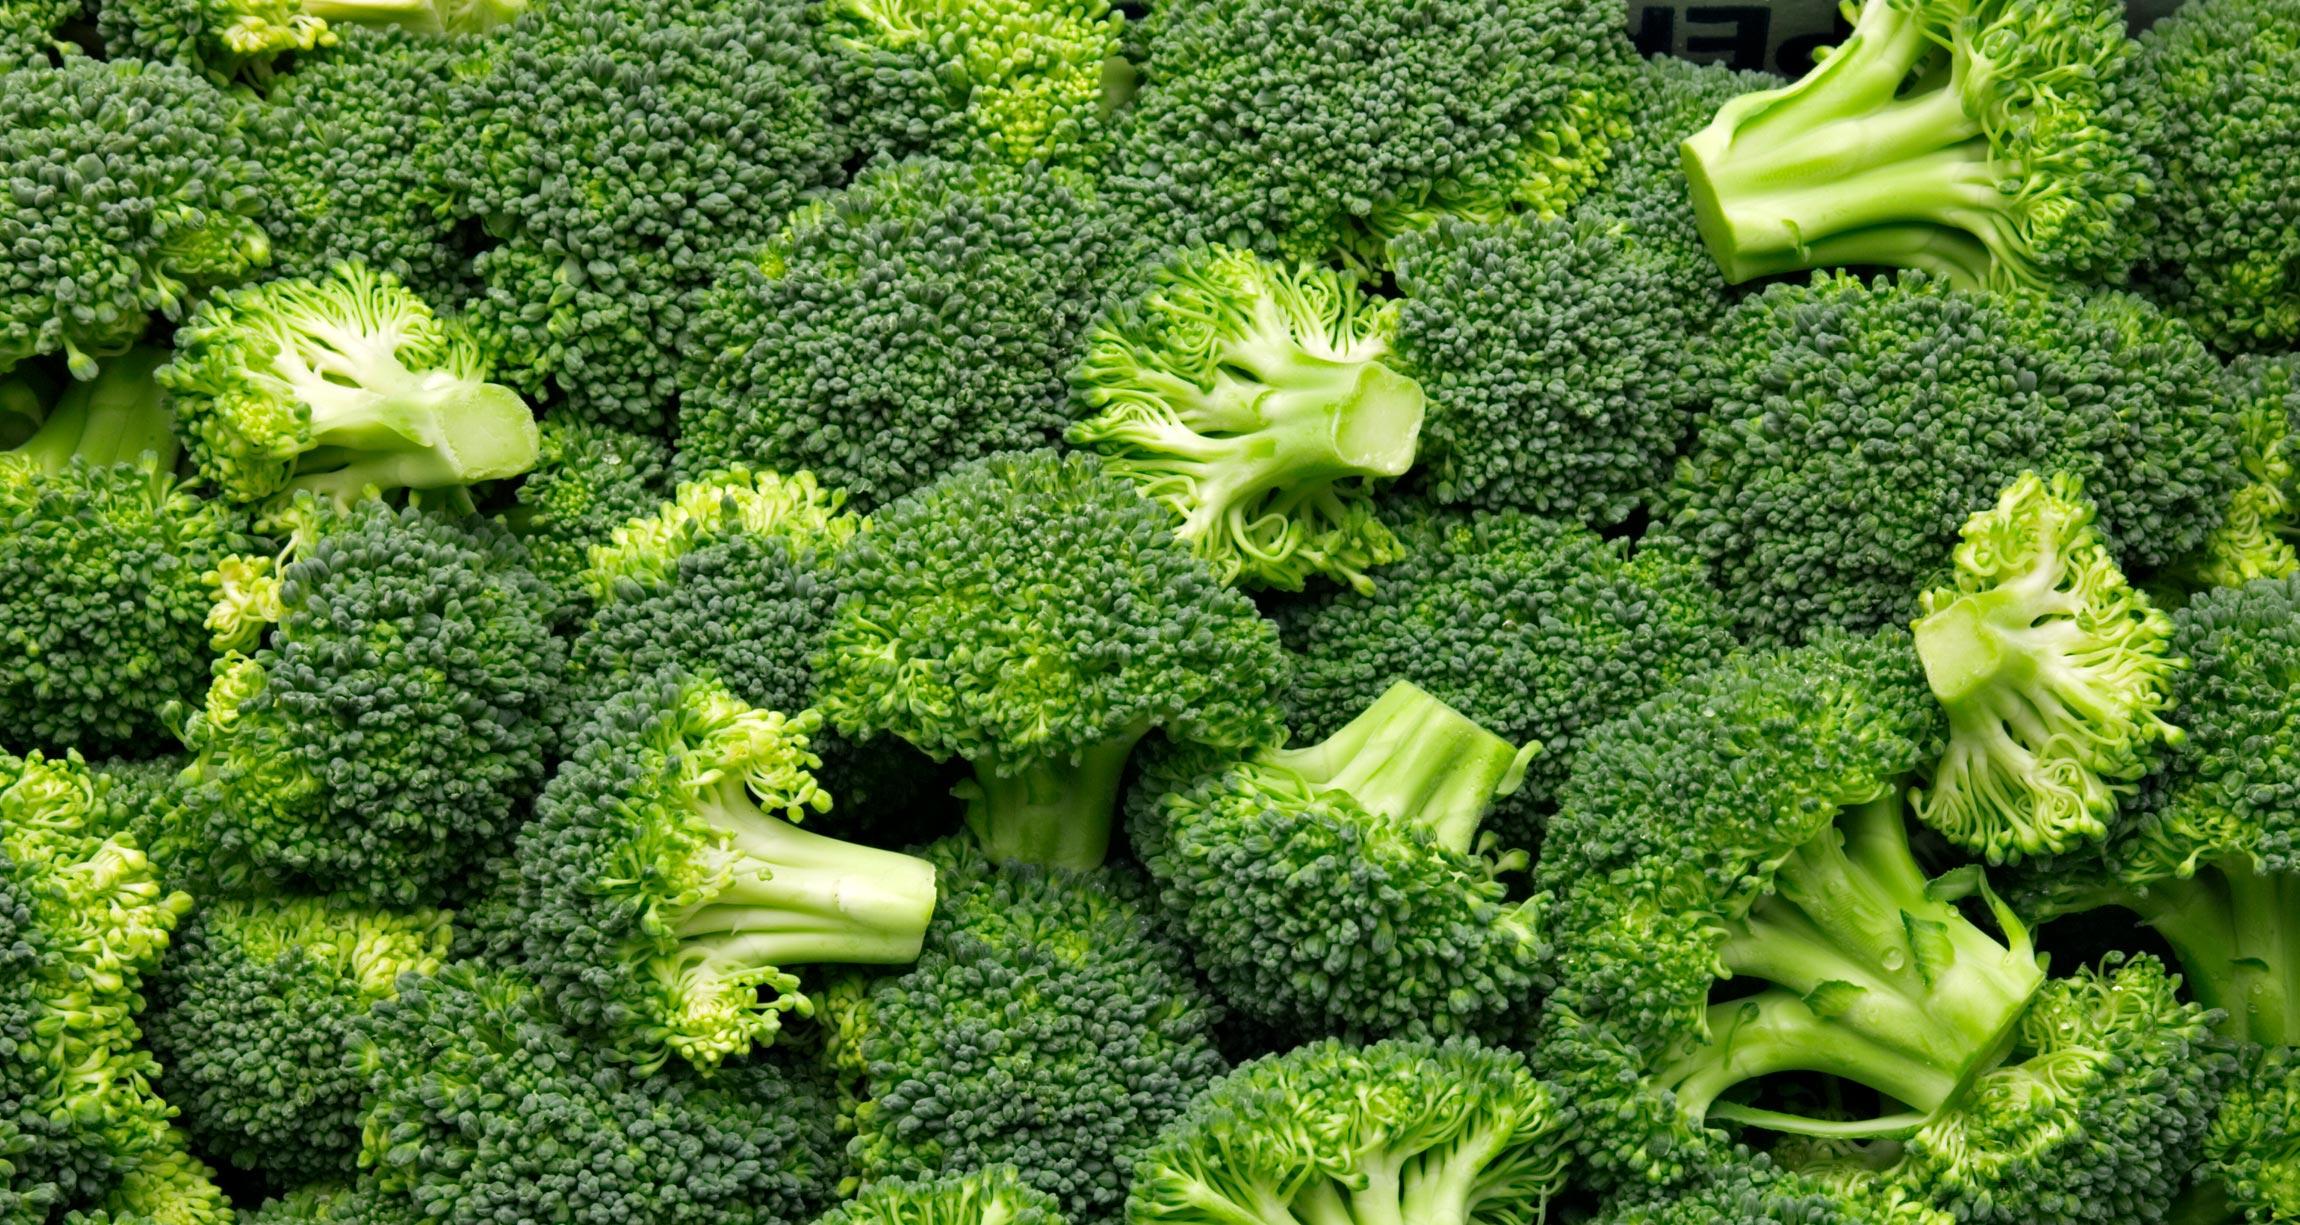 pile of broccoli